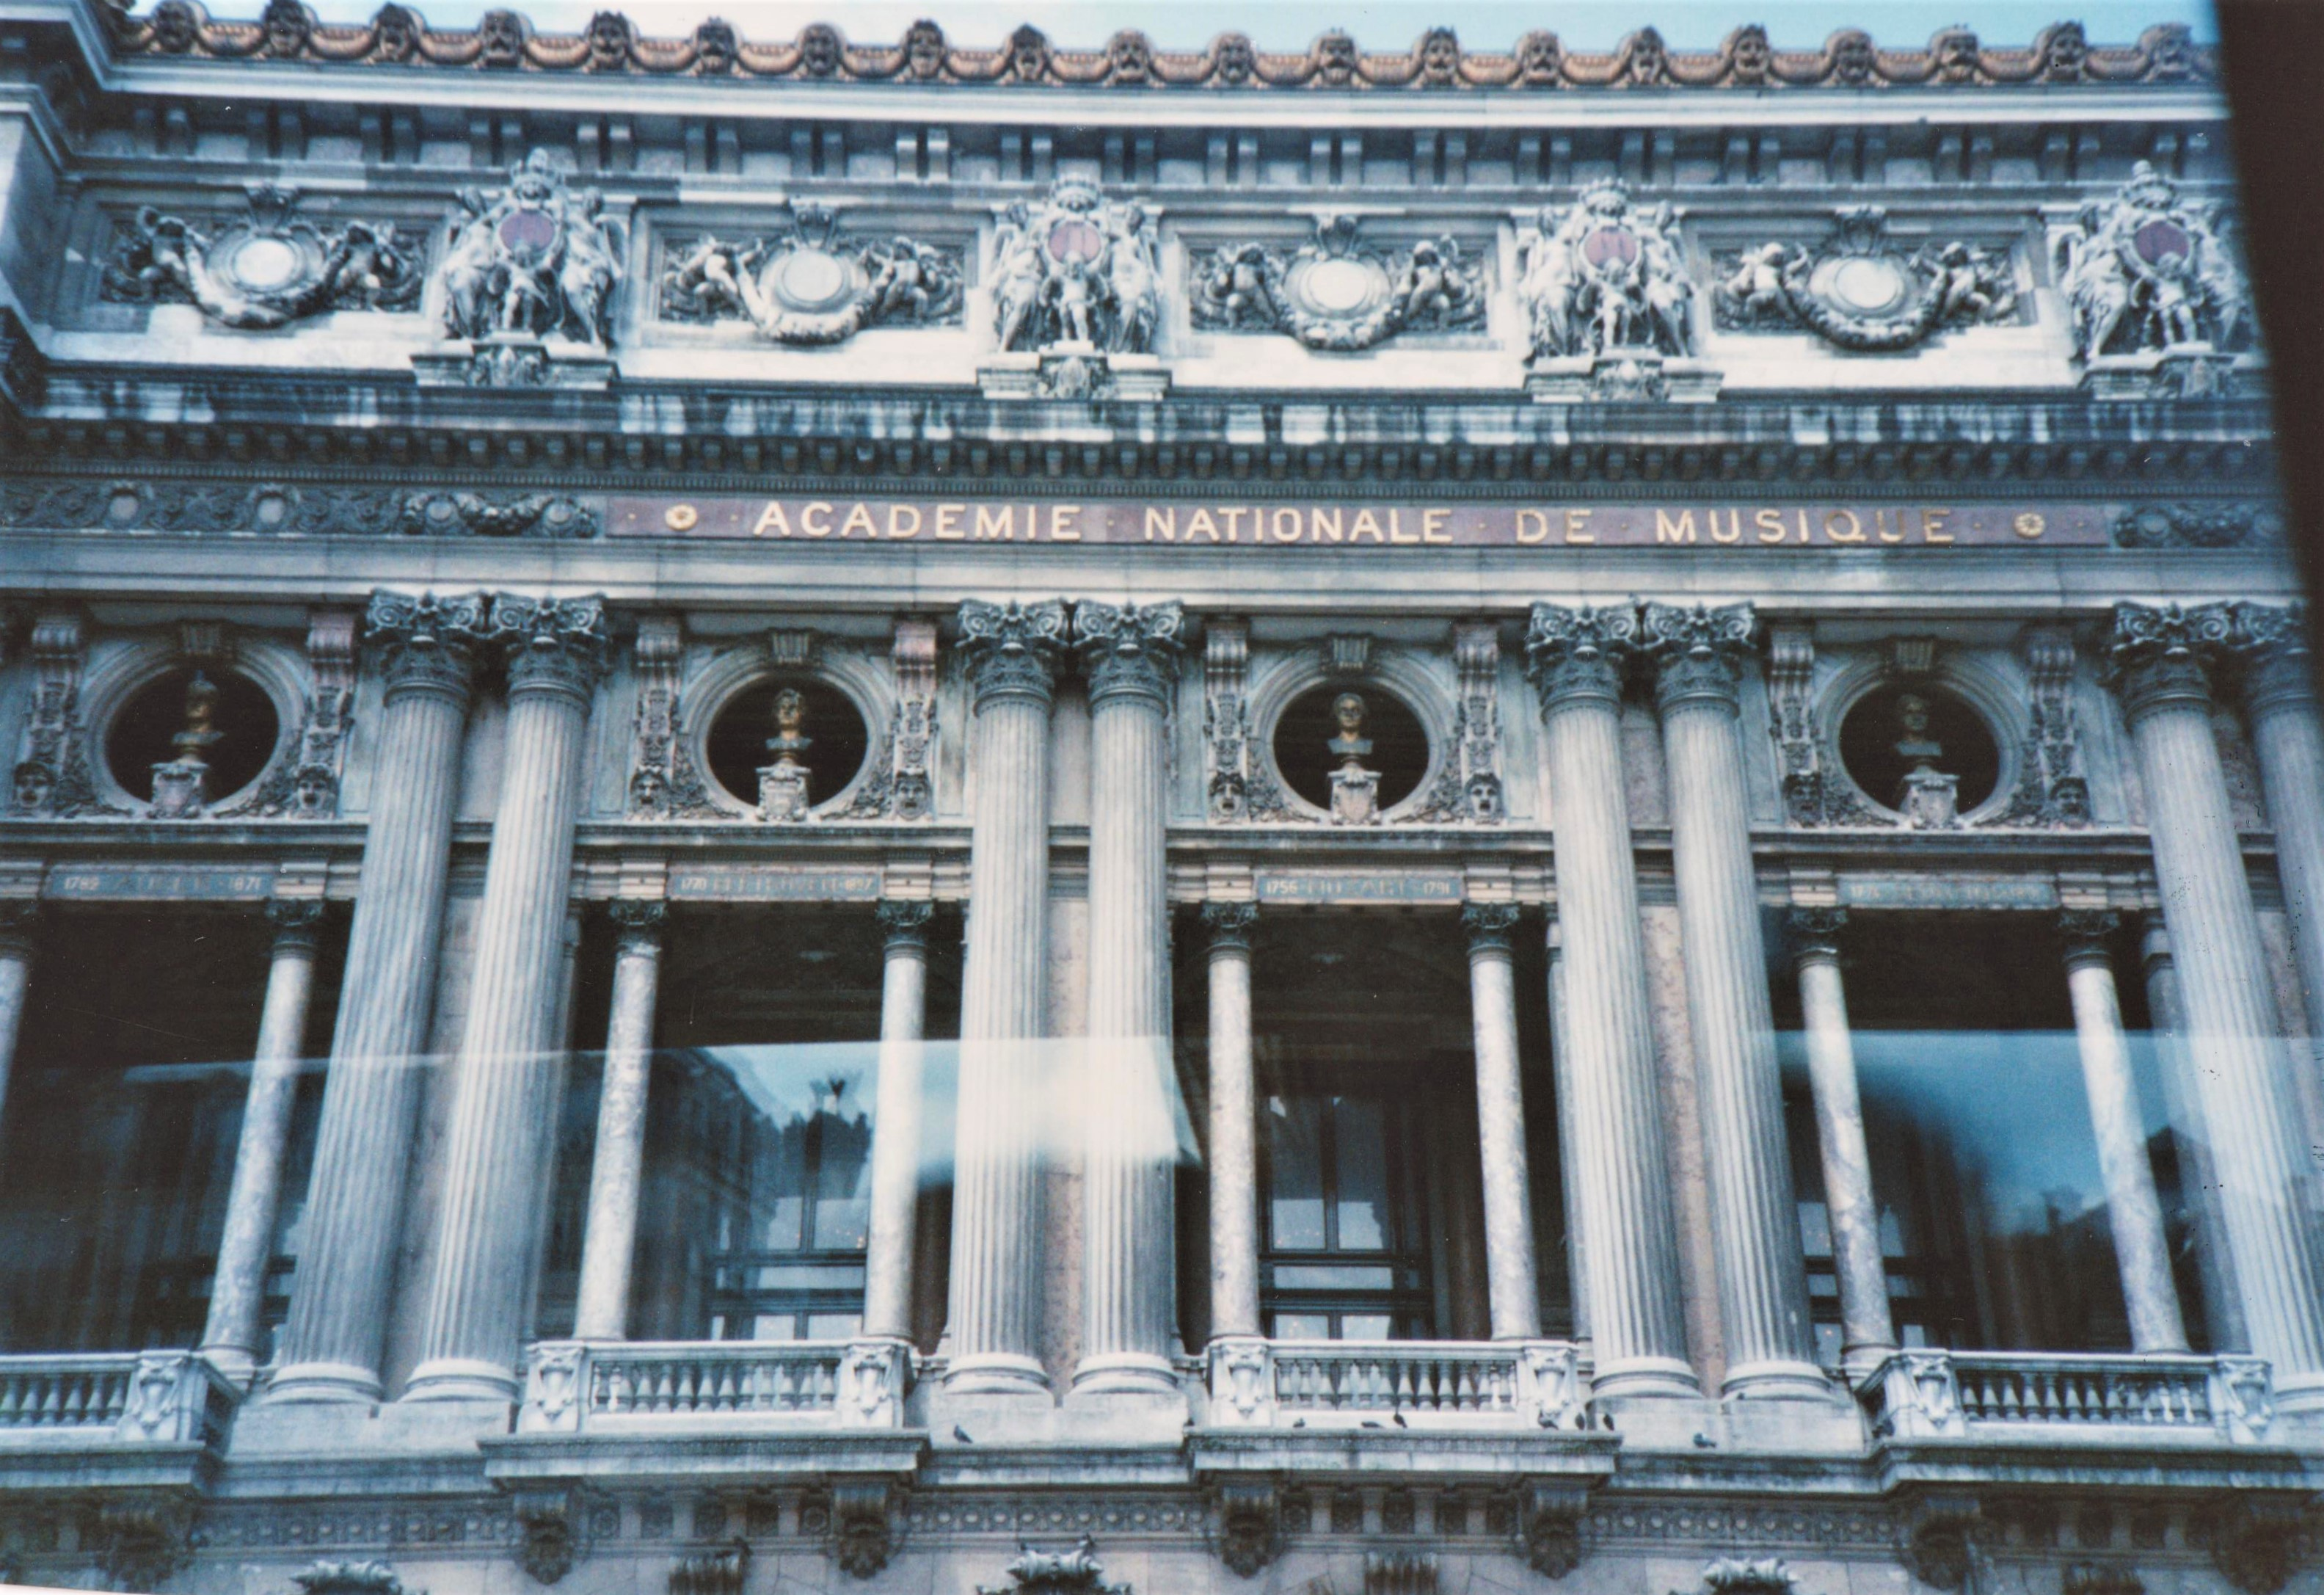 Academie du musique, Paris